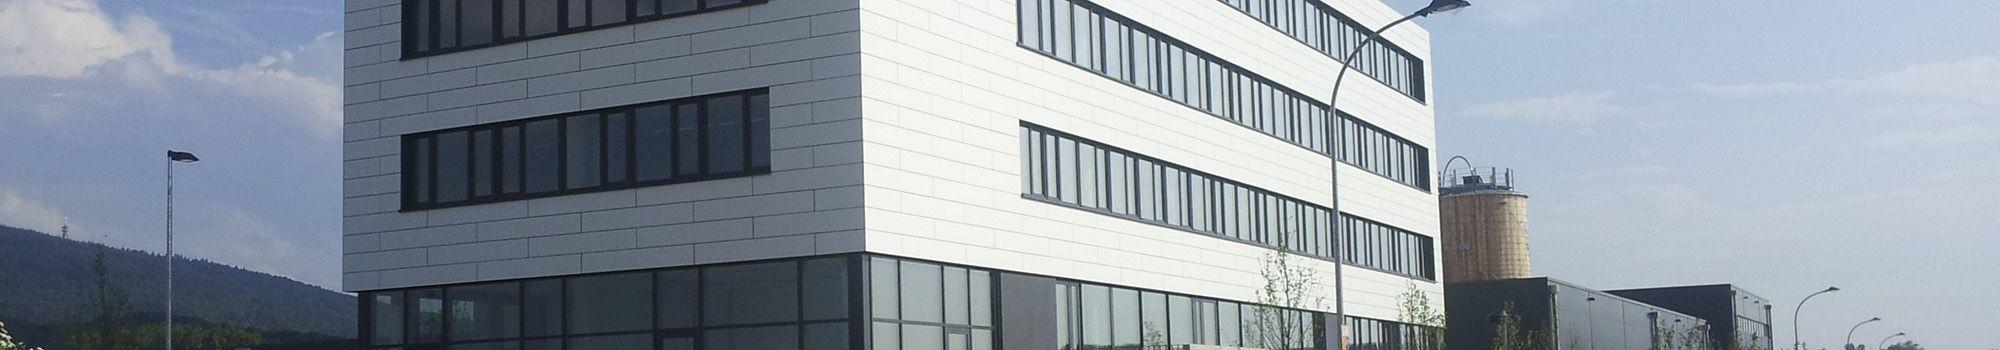 Referenzbericht Baubetriebshof Stadt Baden-Baden